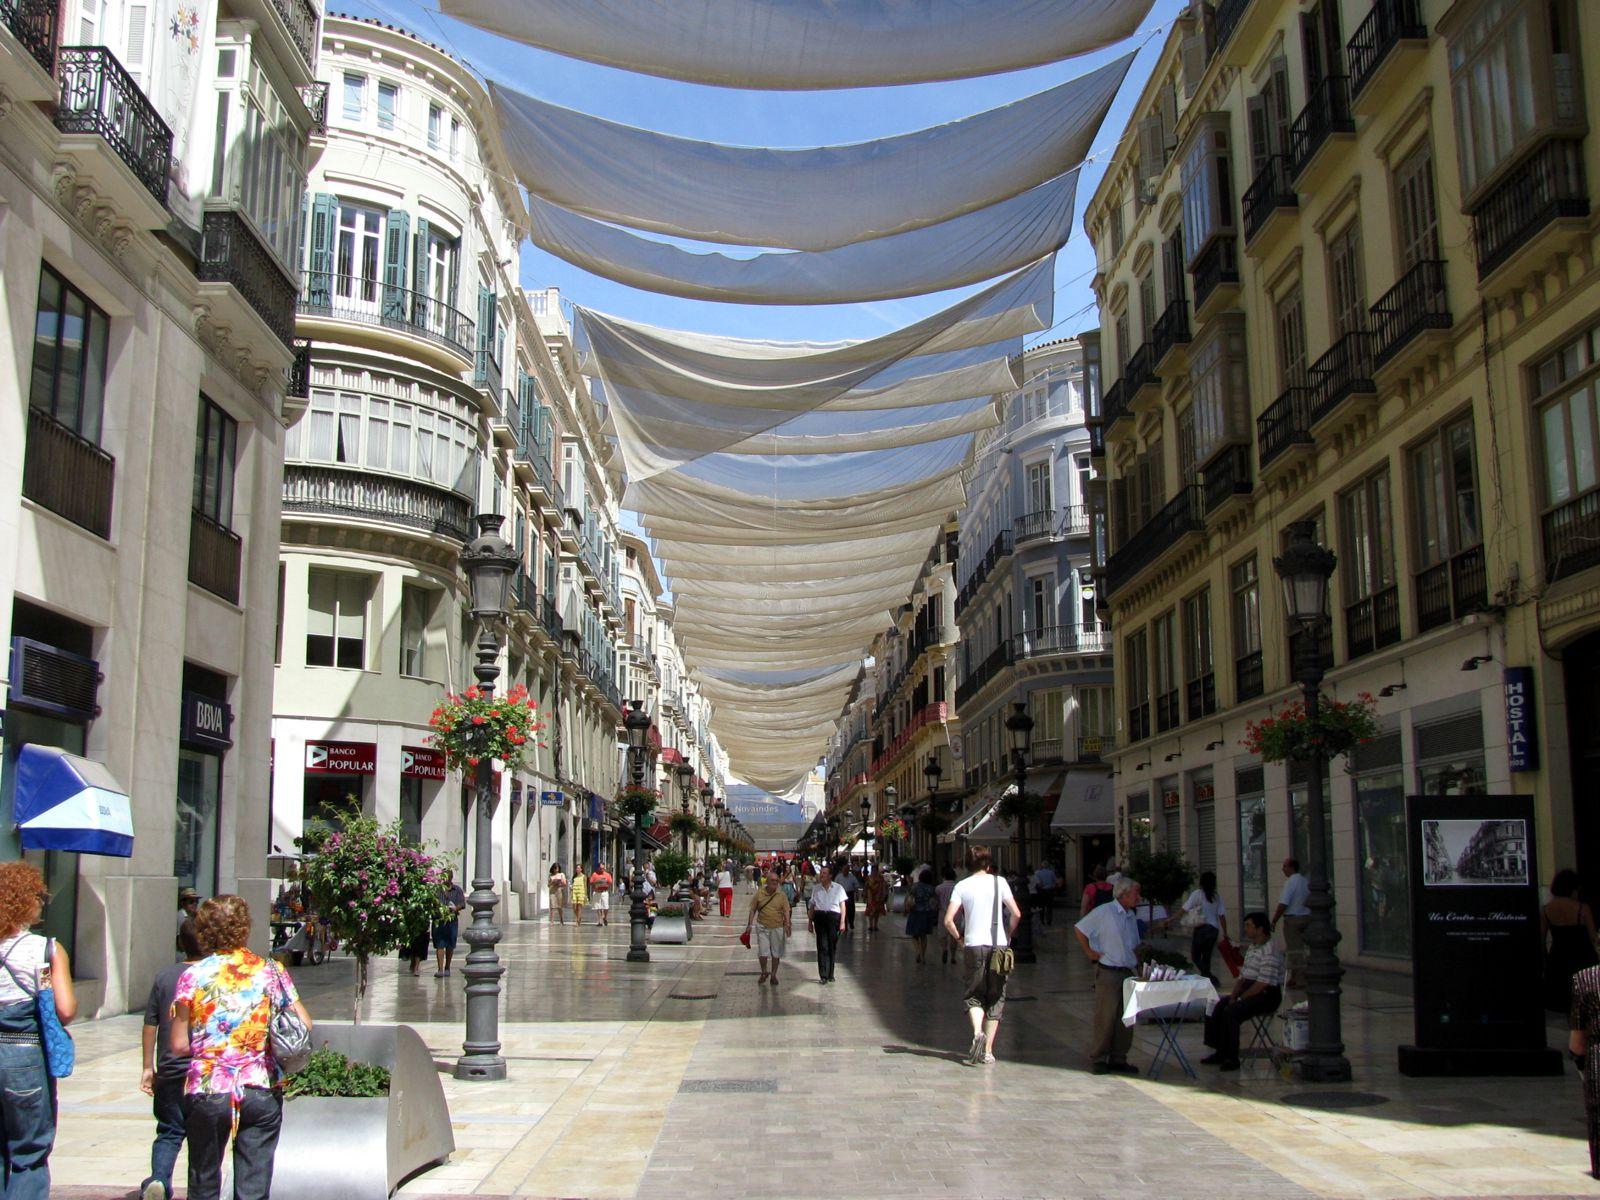 Malaga Altstadt Karte.Malaga Reiseinformation Was Kann Man In Malaga Machen